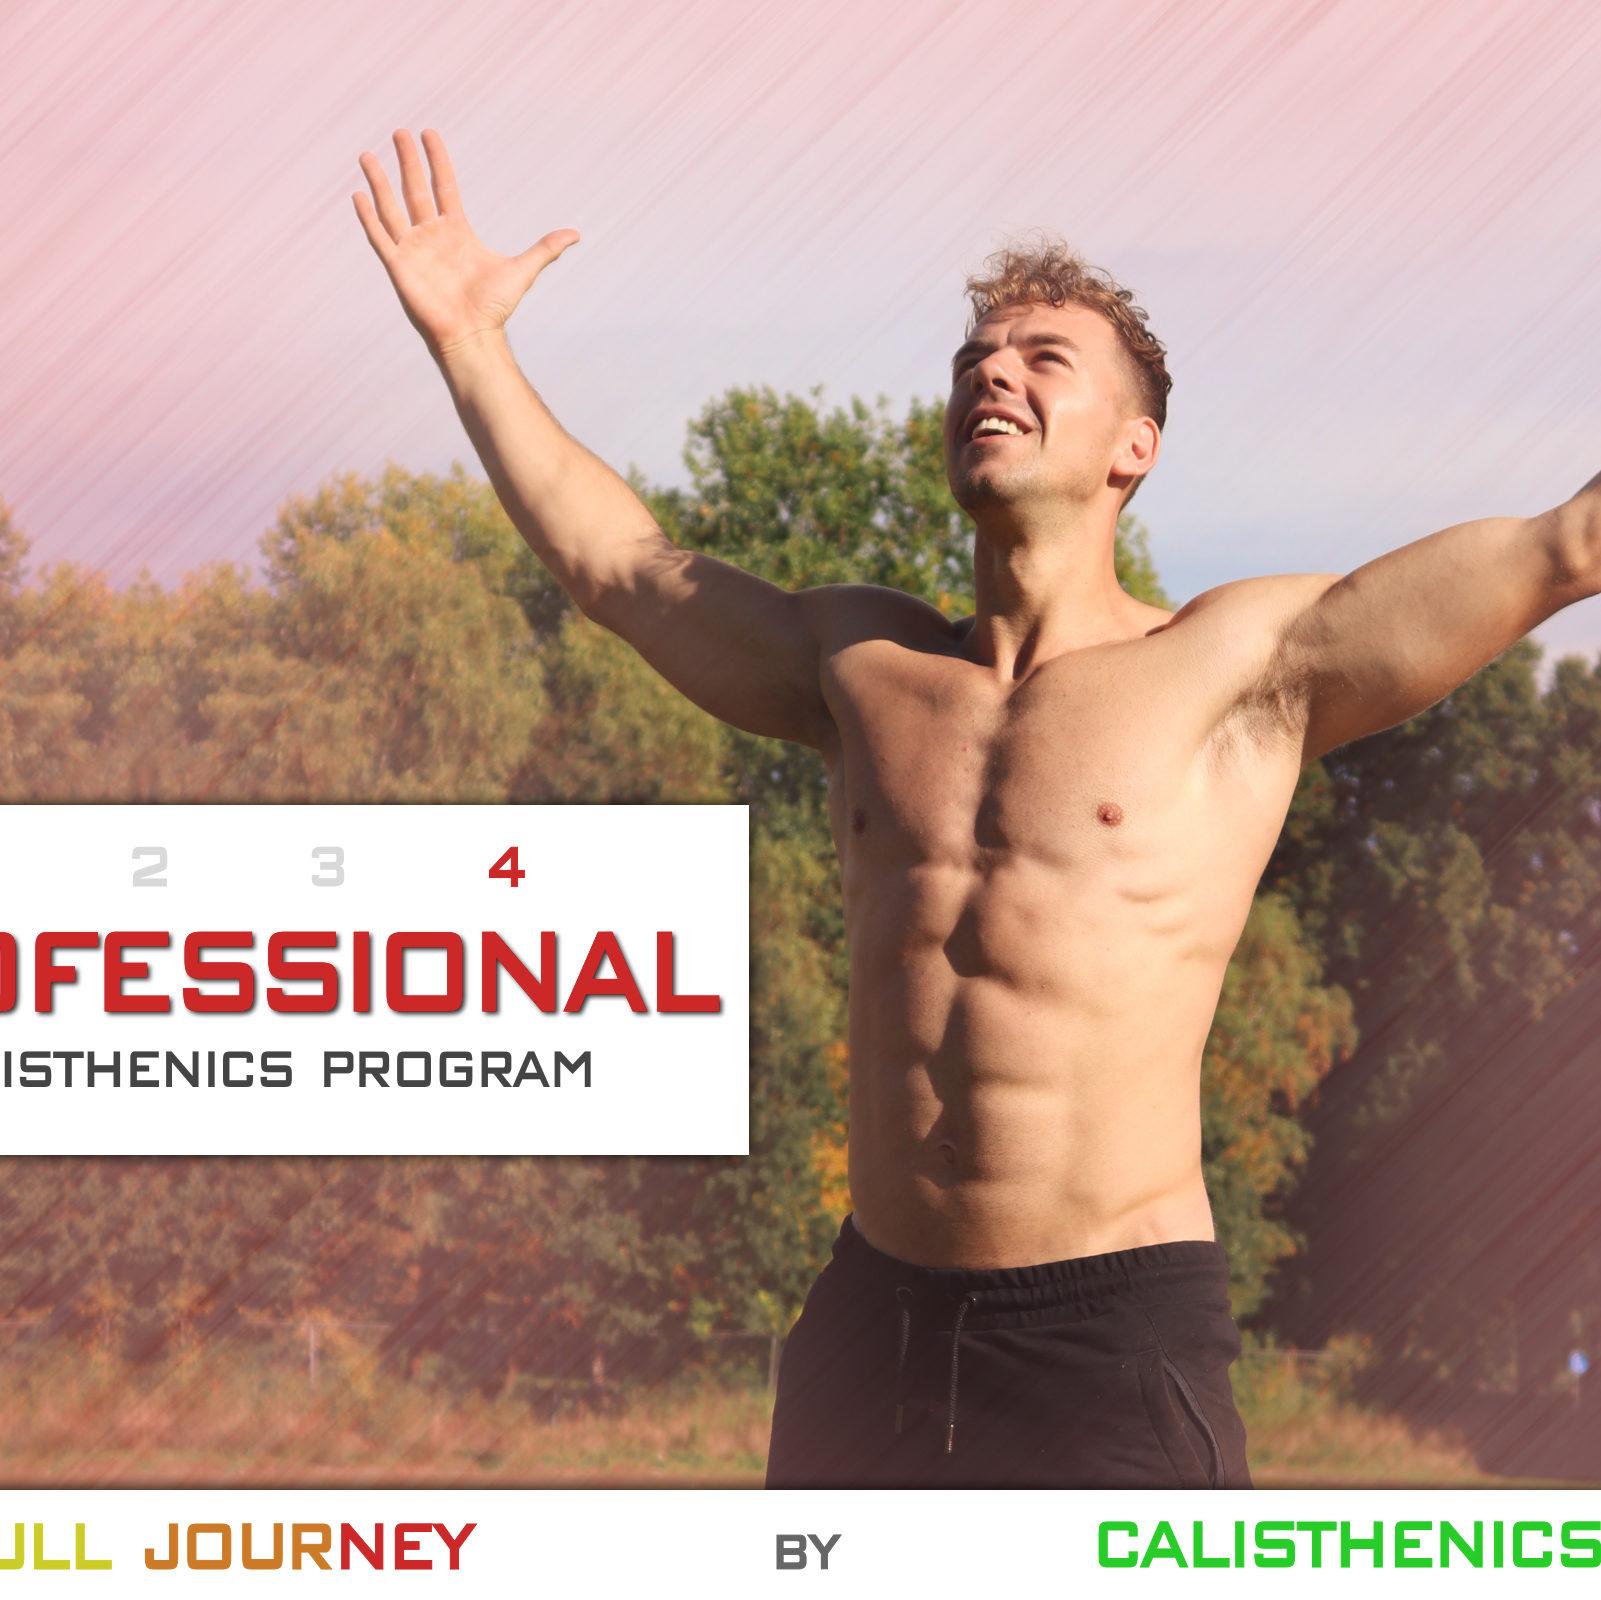 Calisthenics Professional Workout Program